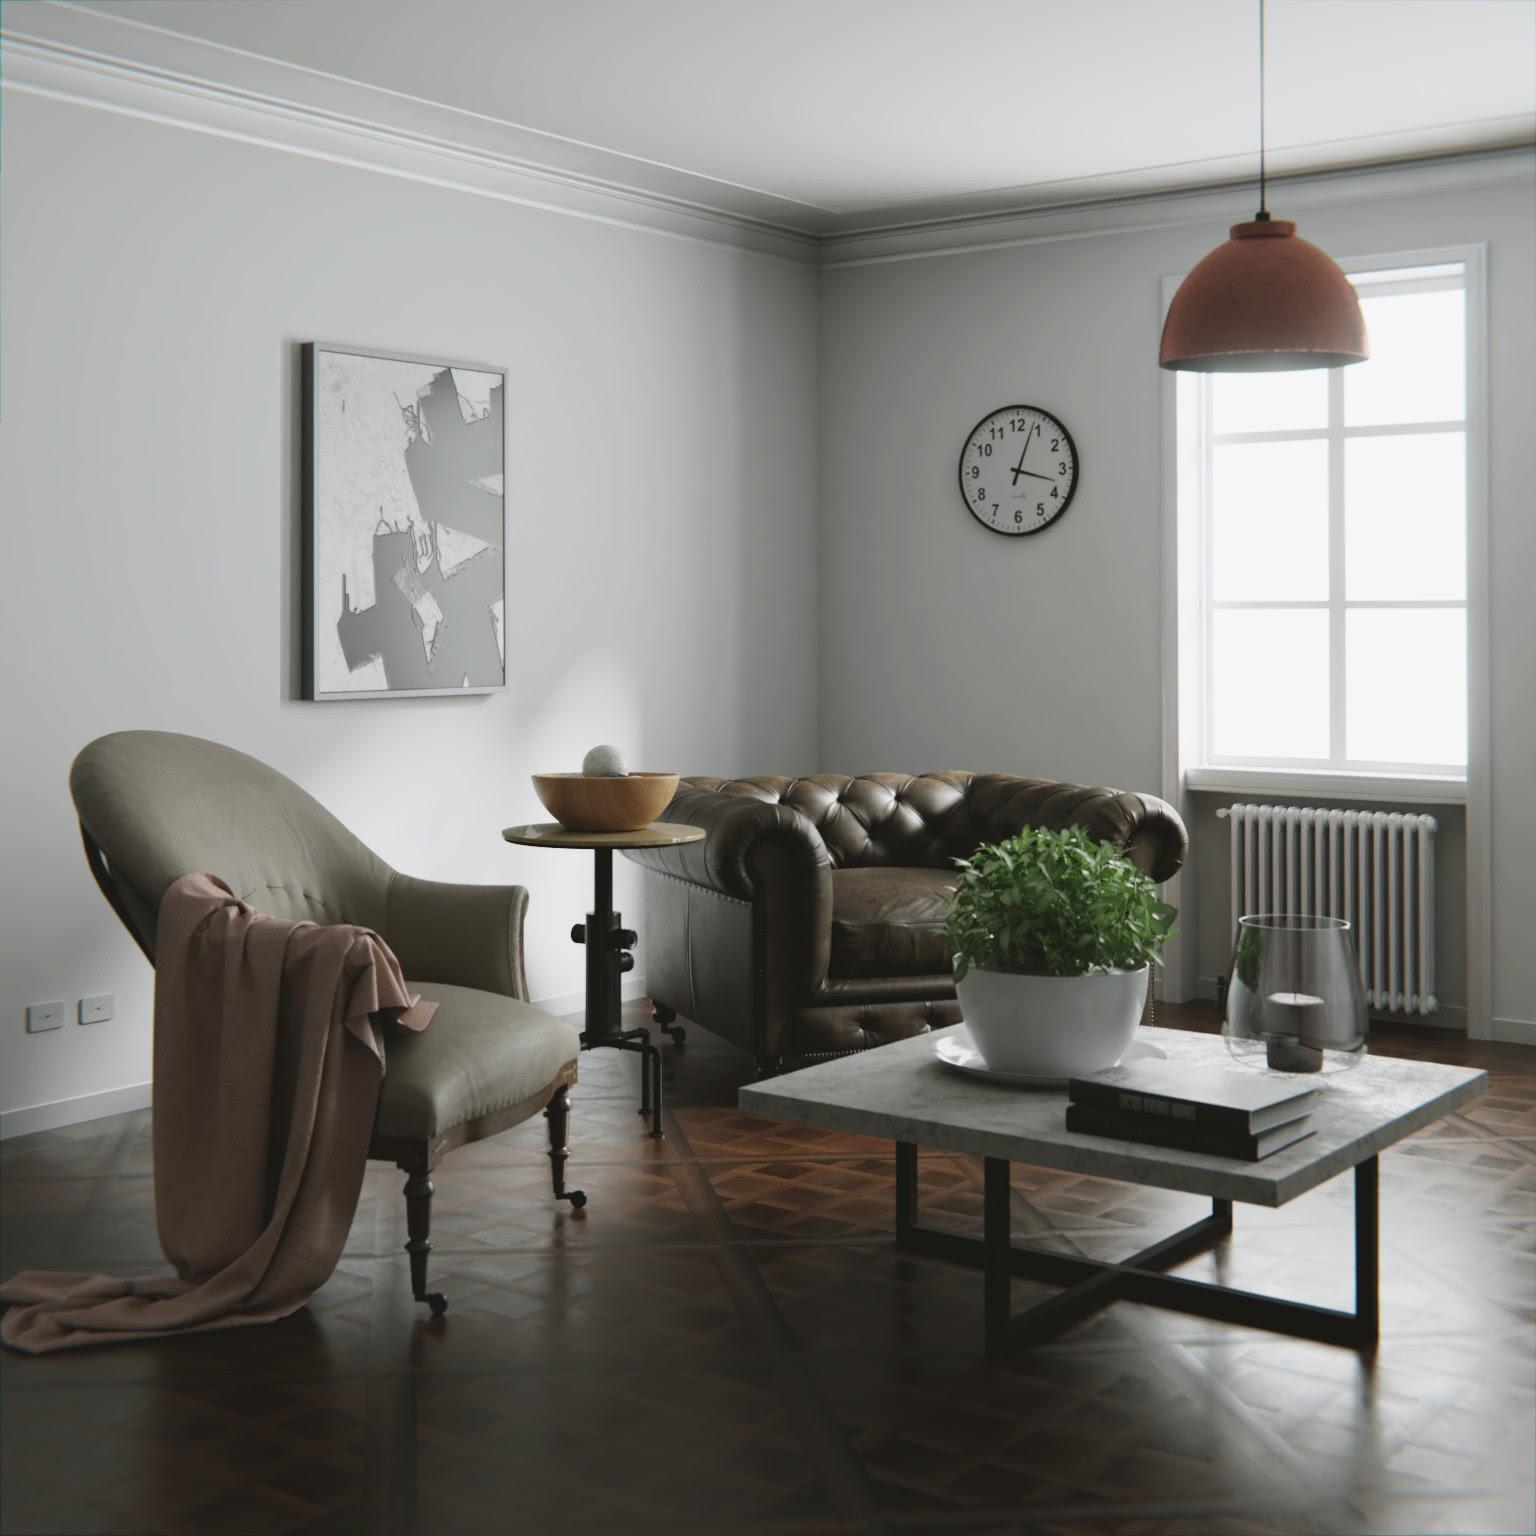 3D Rendering of Furniture using Blender